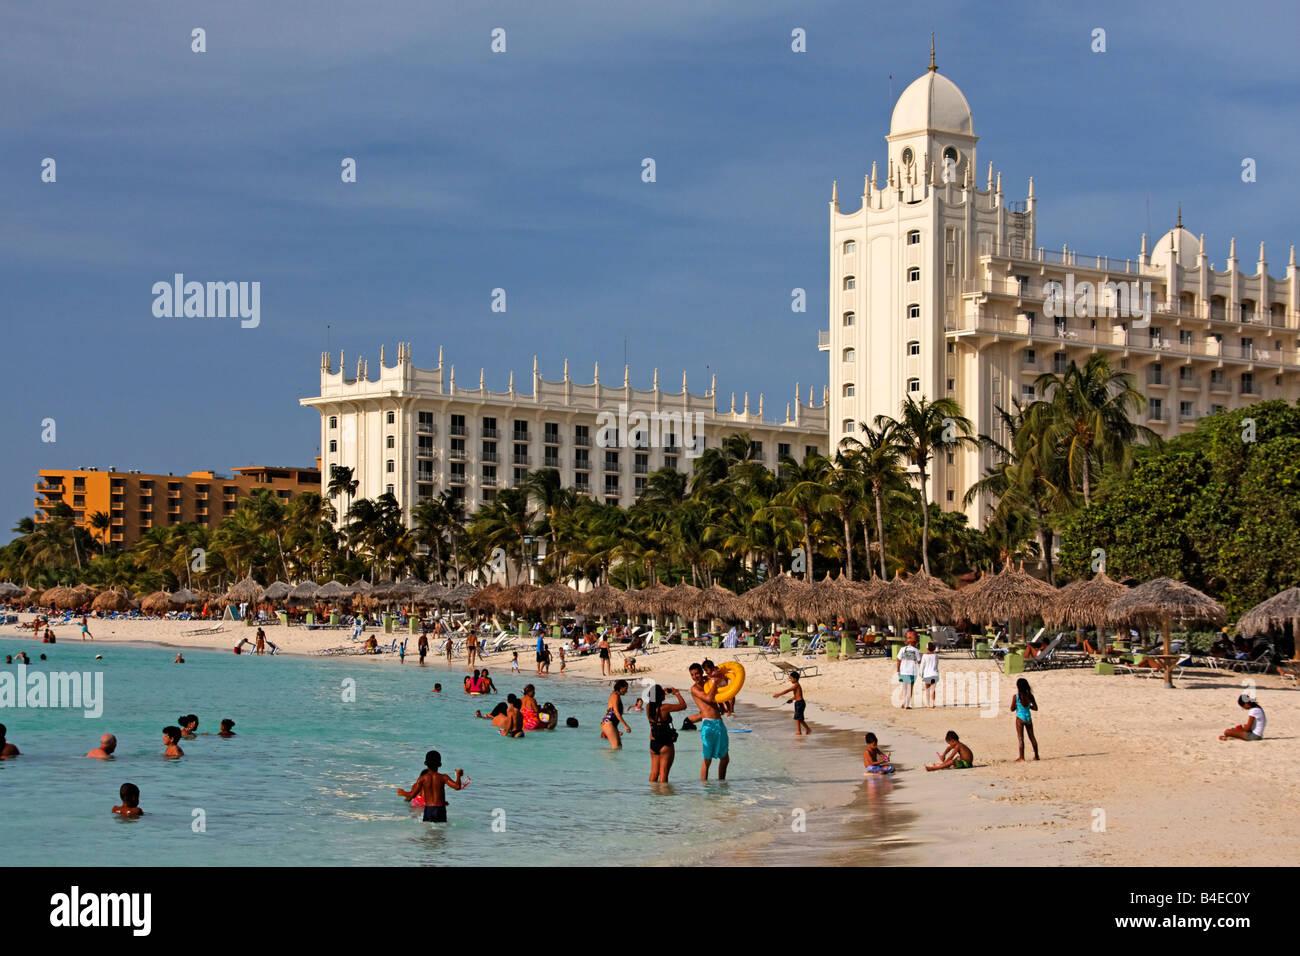 Abc Local News West Palm Beach